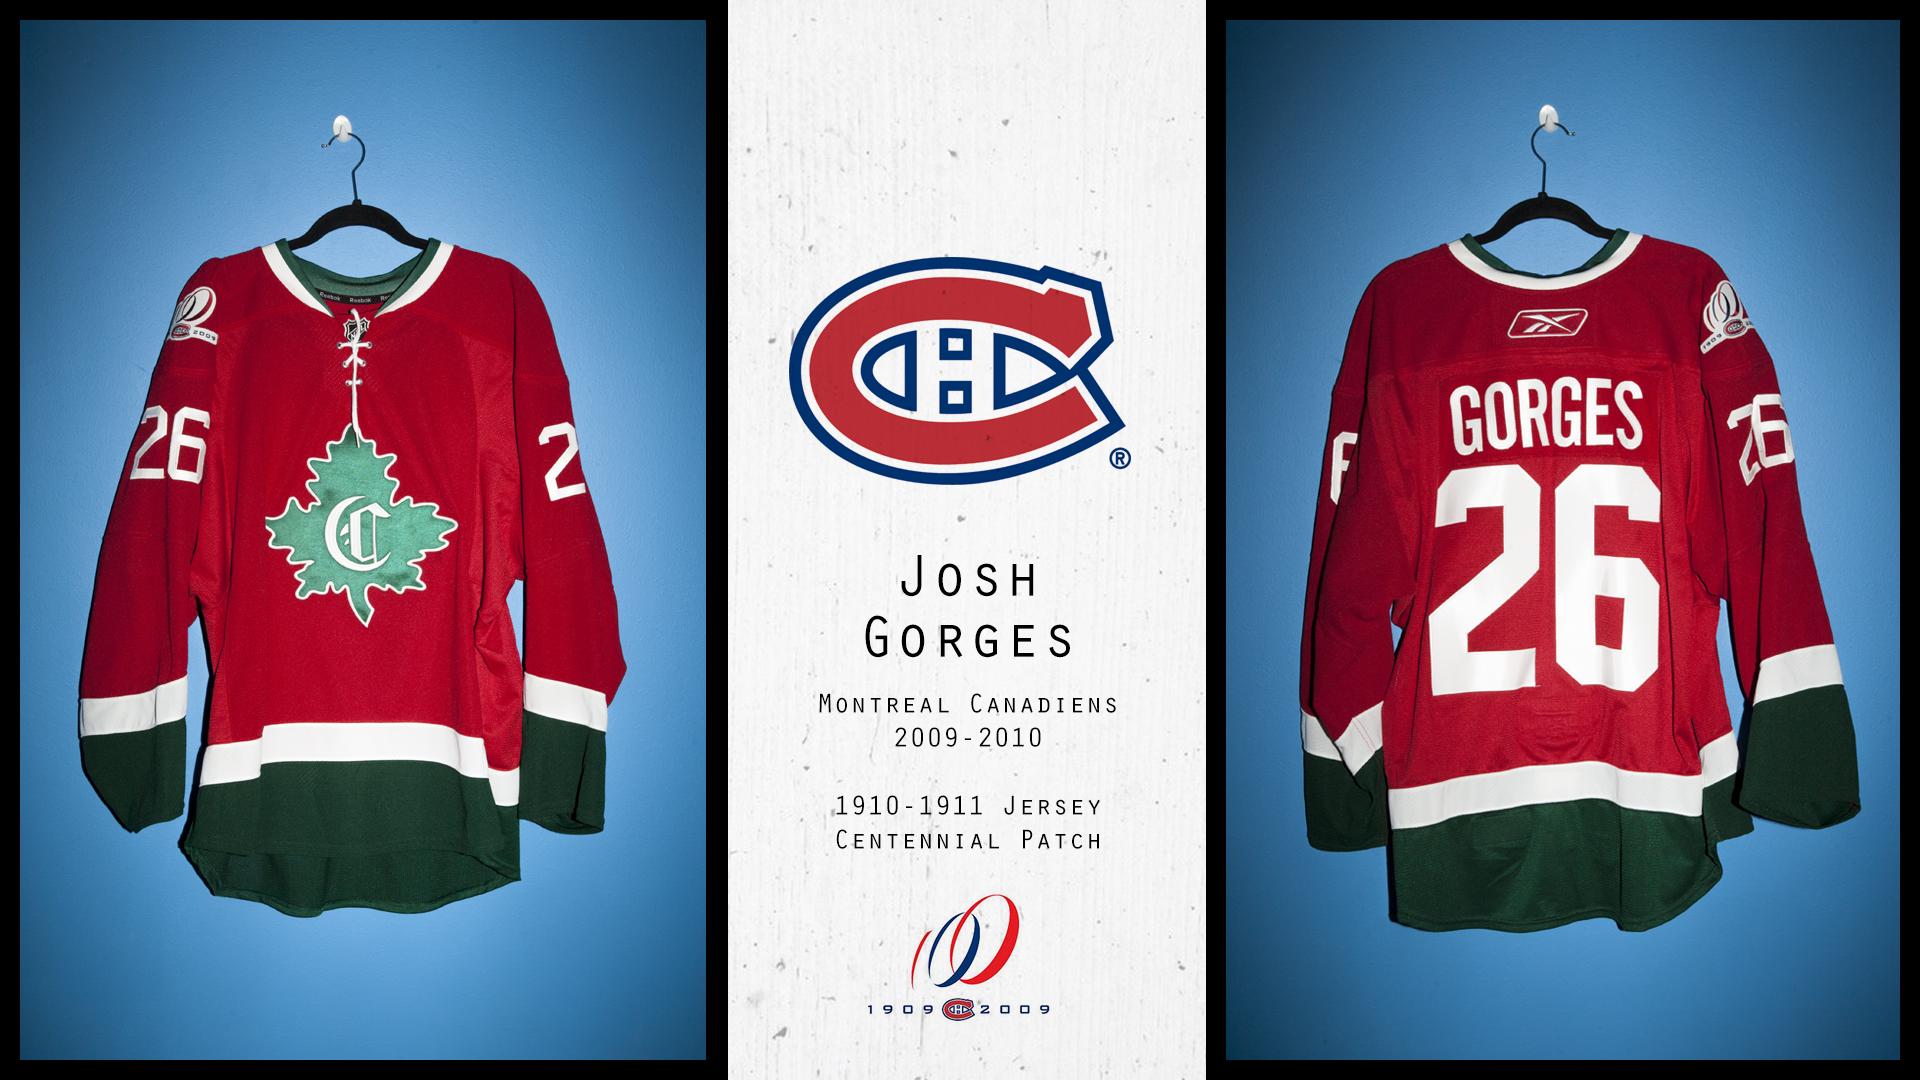 ... 033GorgesHabs0910 Montreal Canadiens Centennial 1915-16 ... a785926356b